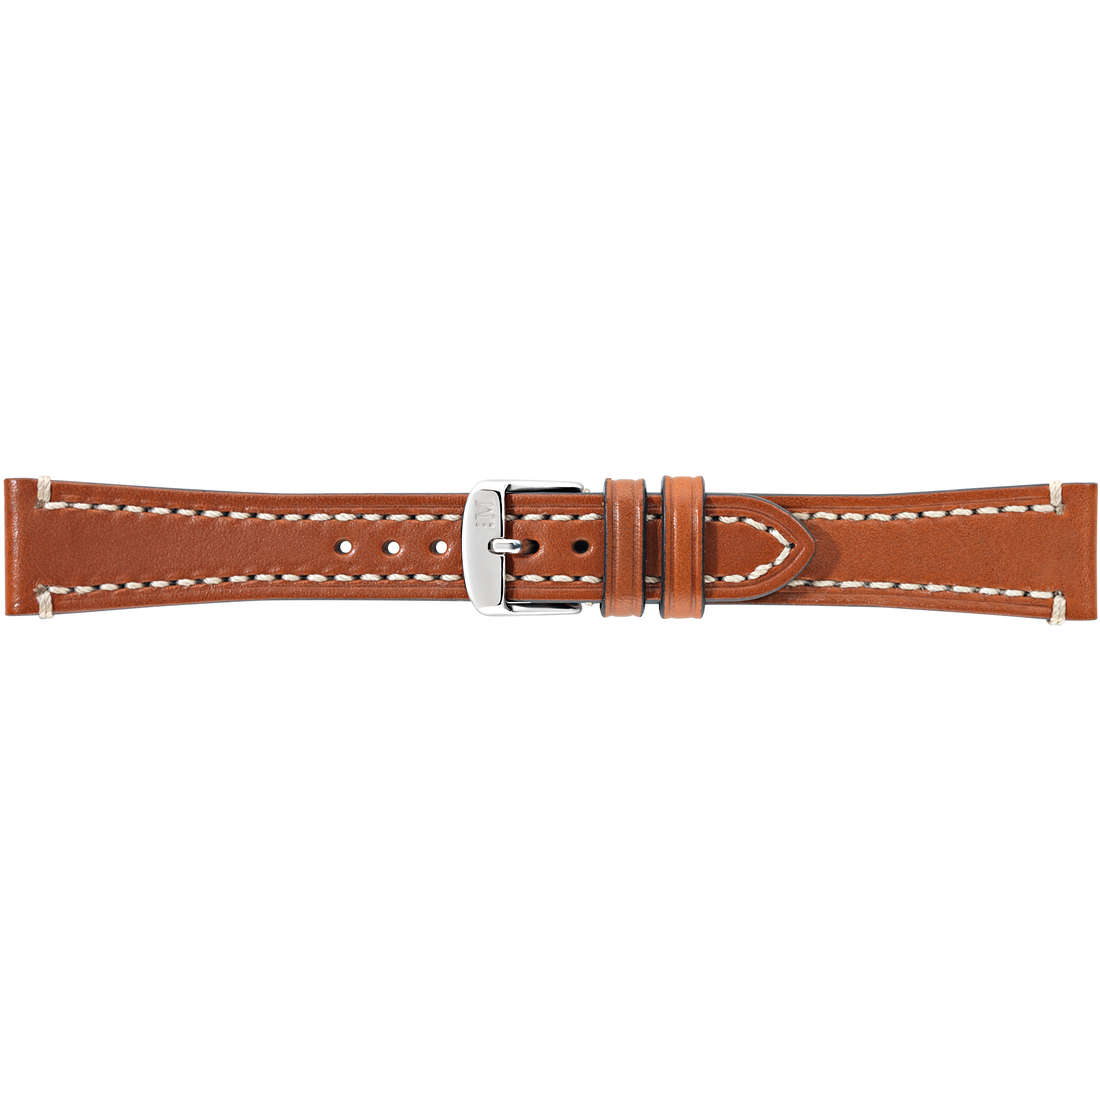 watch watch bands watch straps man Morellato Manufatti A01X4539B51041CR20